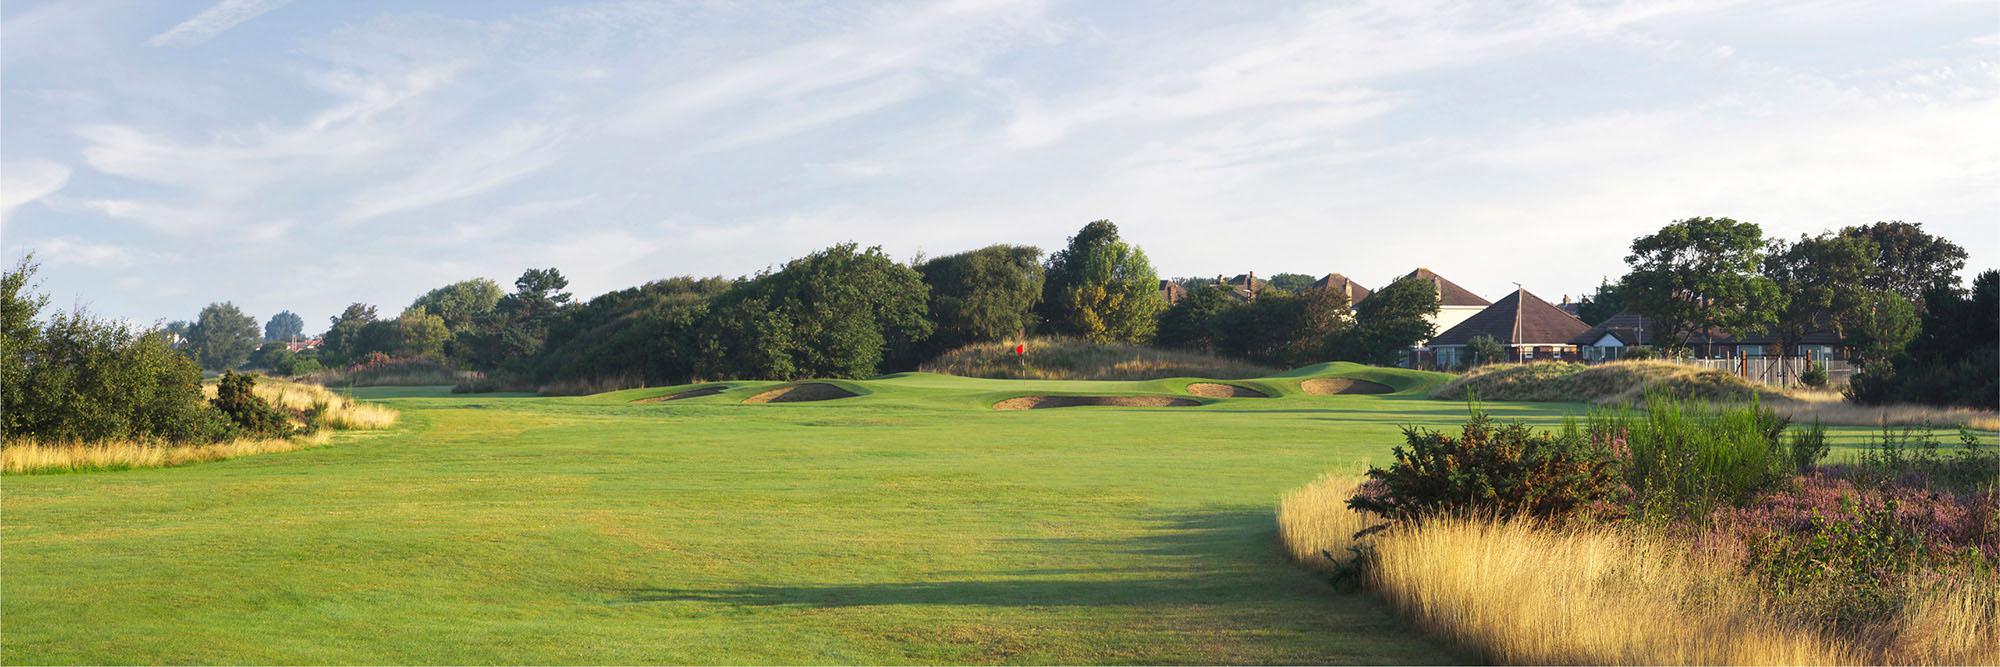 Royal Lytham & St Annes No. 12 | Stonehouse Golf